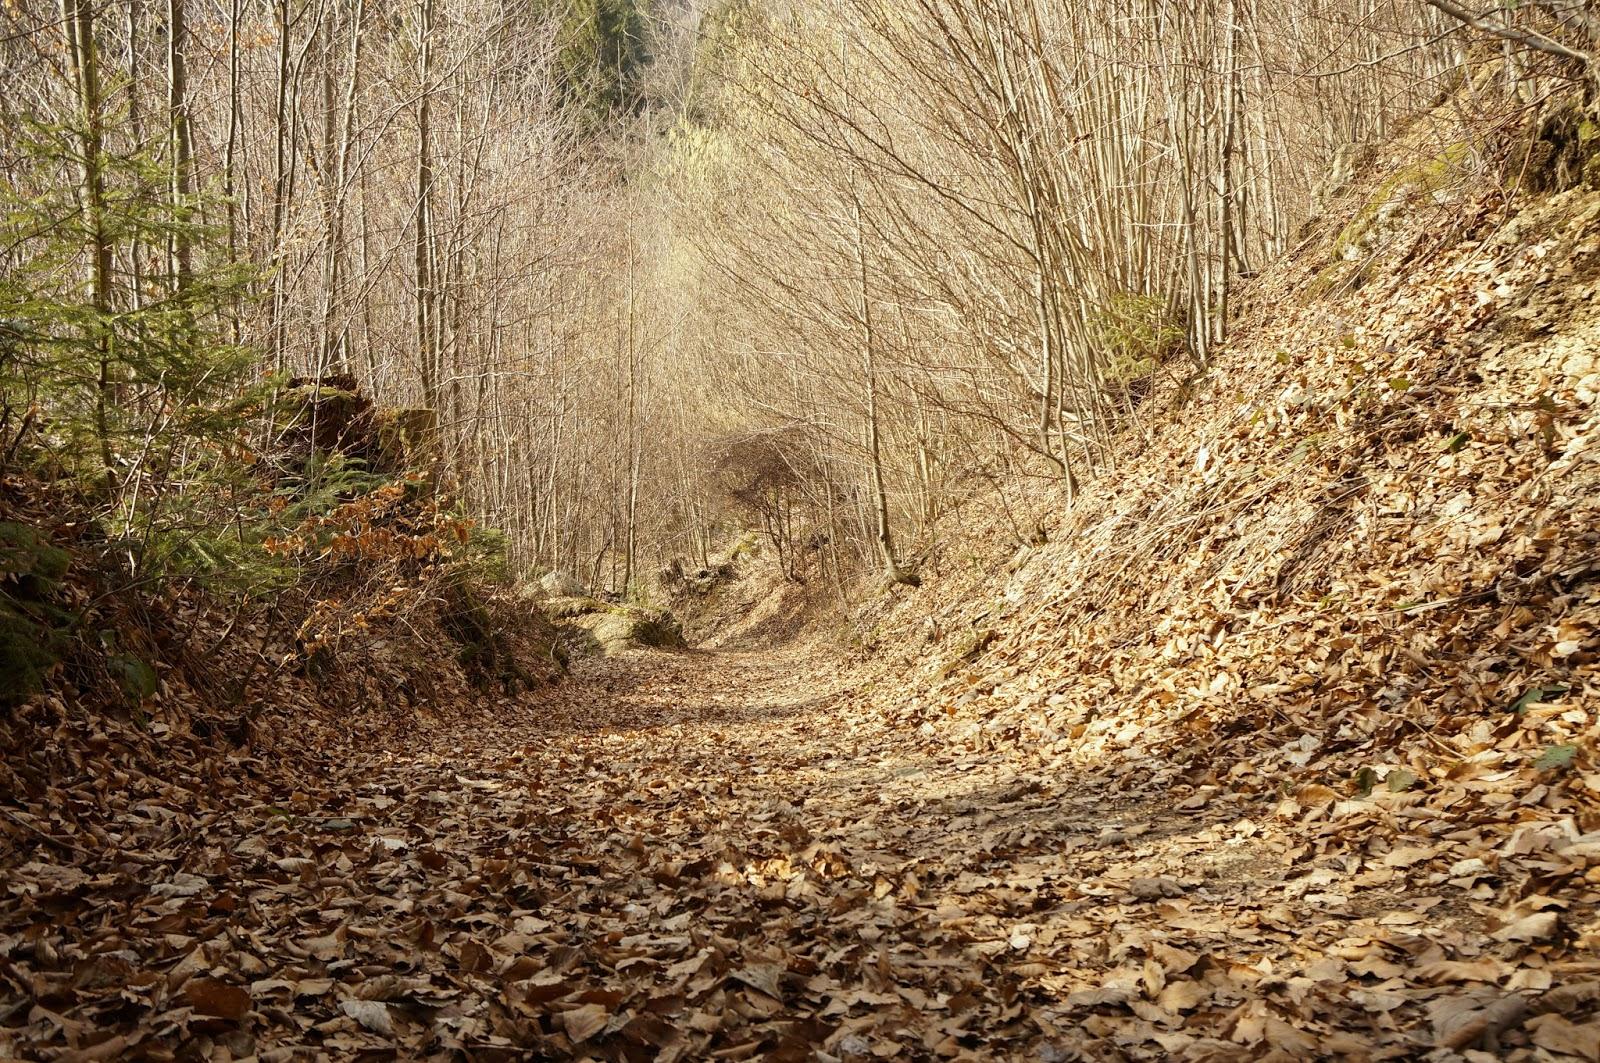 Rehabilitationsbericht nach Unfall_Foto Wald